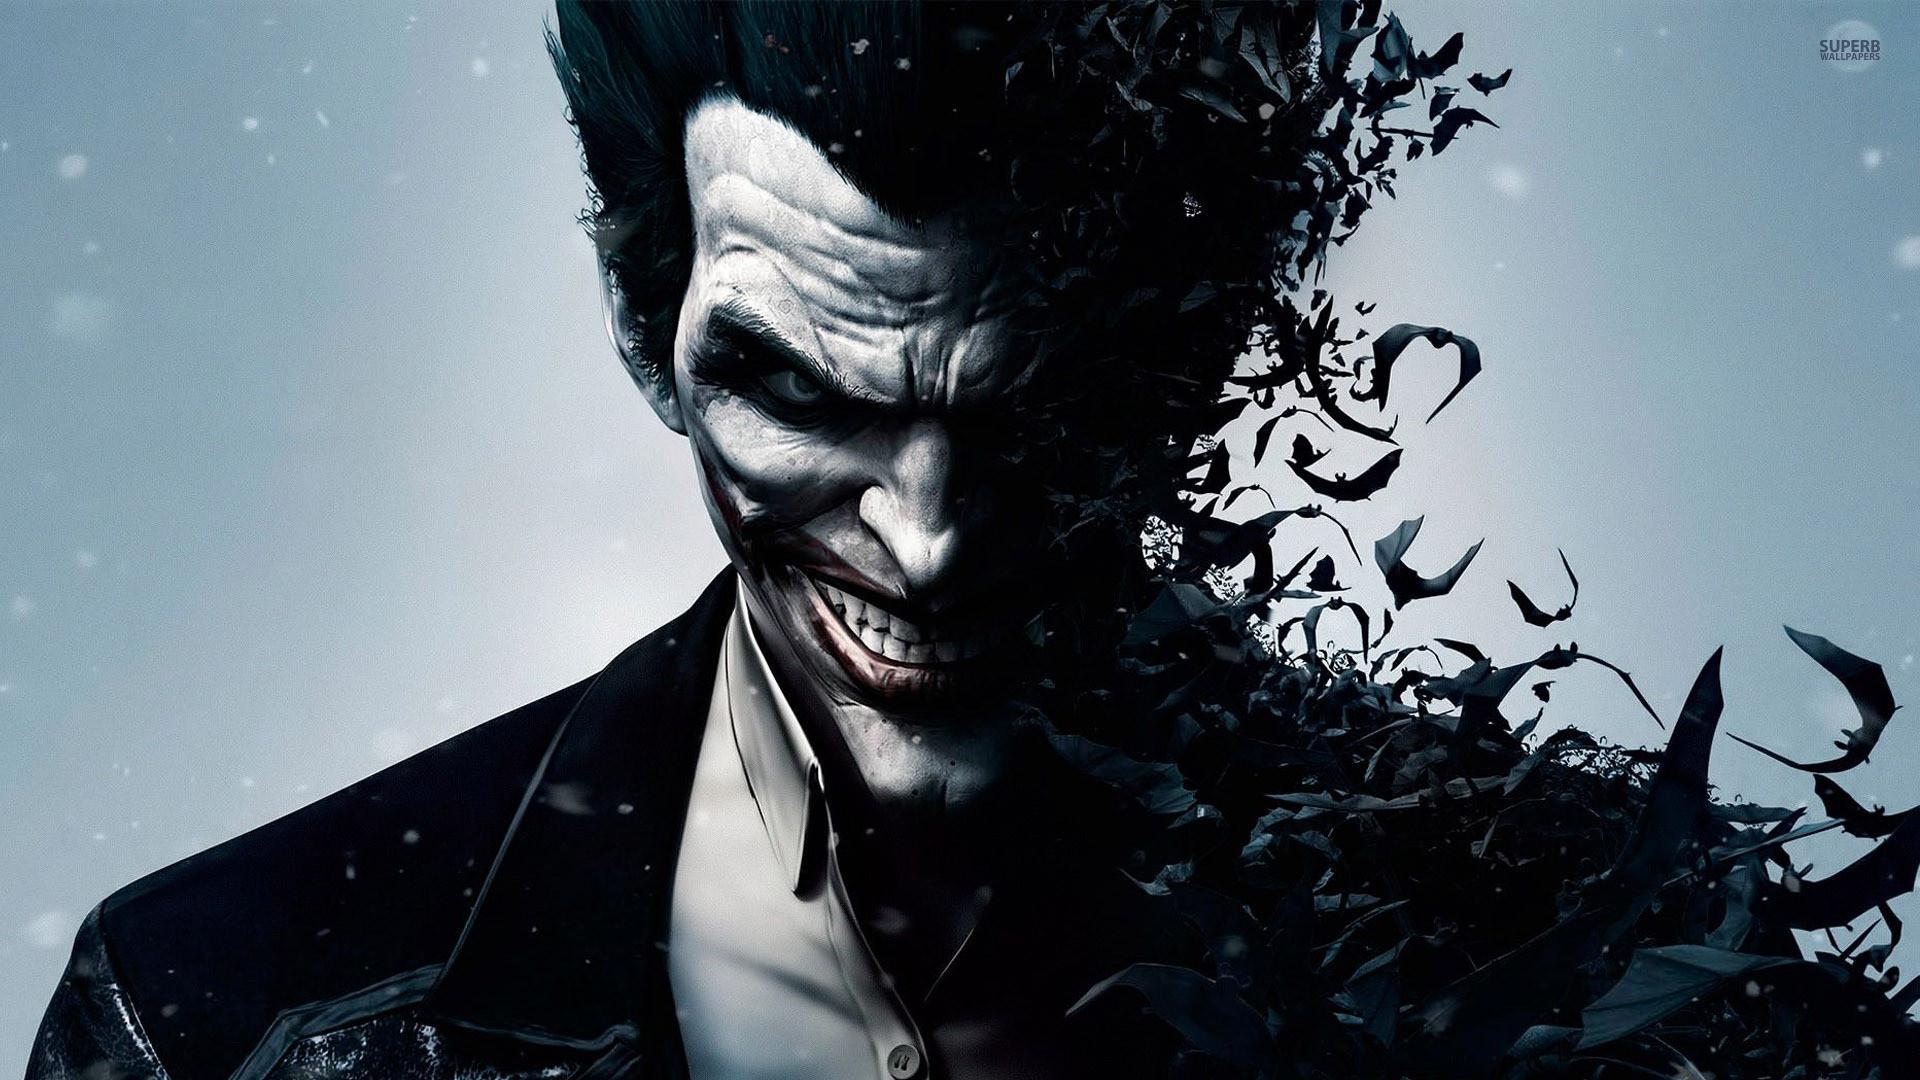 batman arkham origins | Joker Batman Arkham Origins Wallpaper – HD  Wallpapers